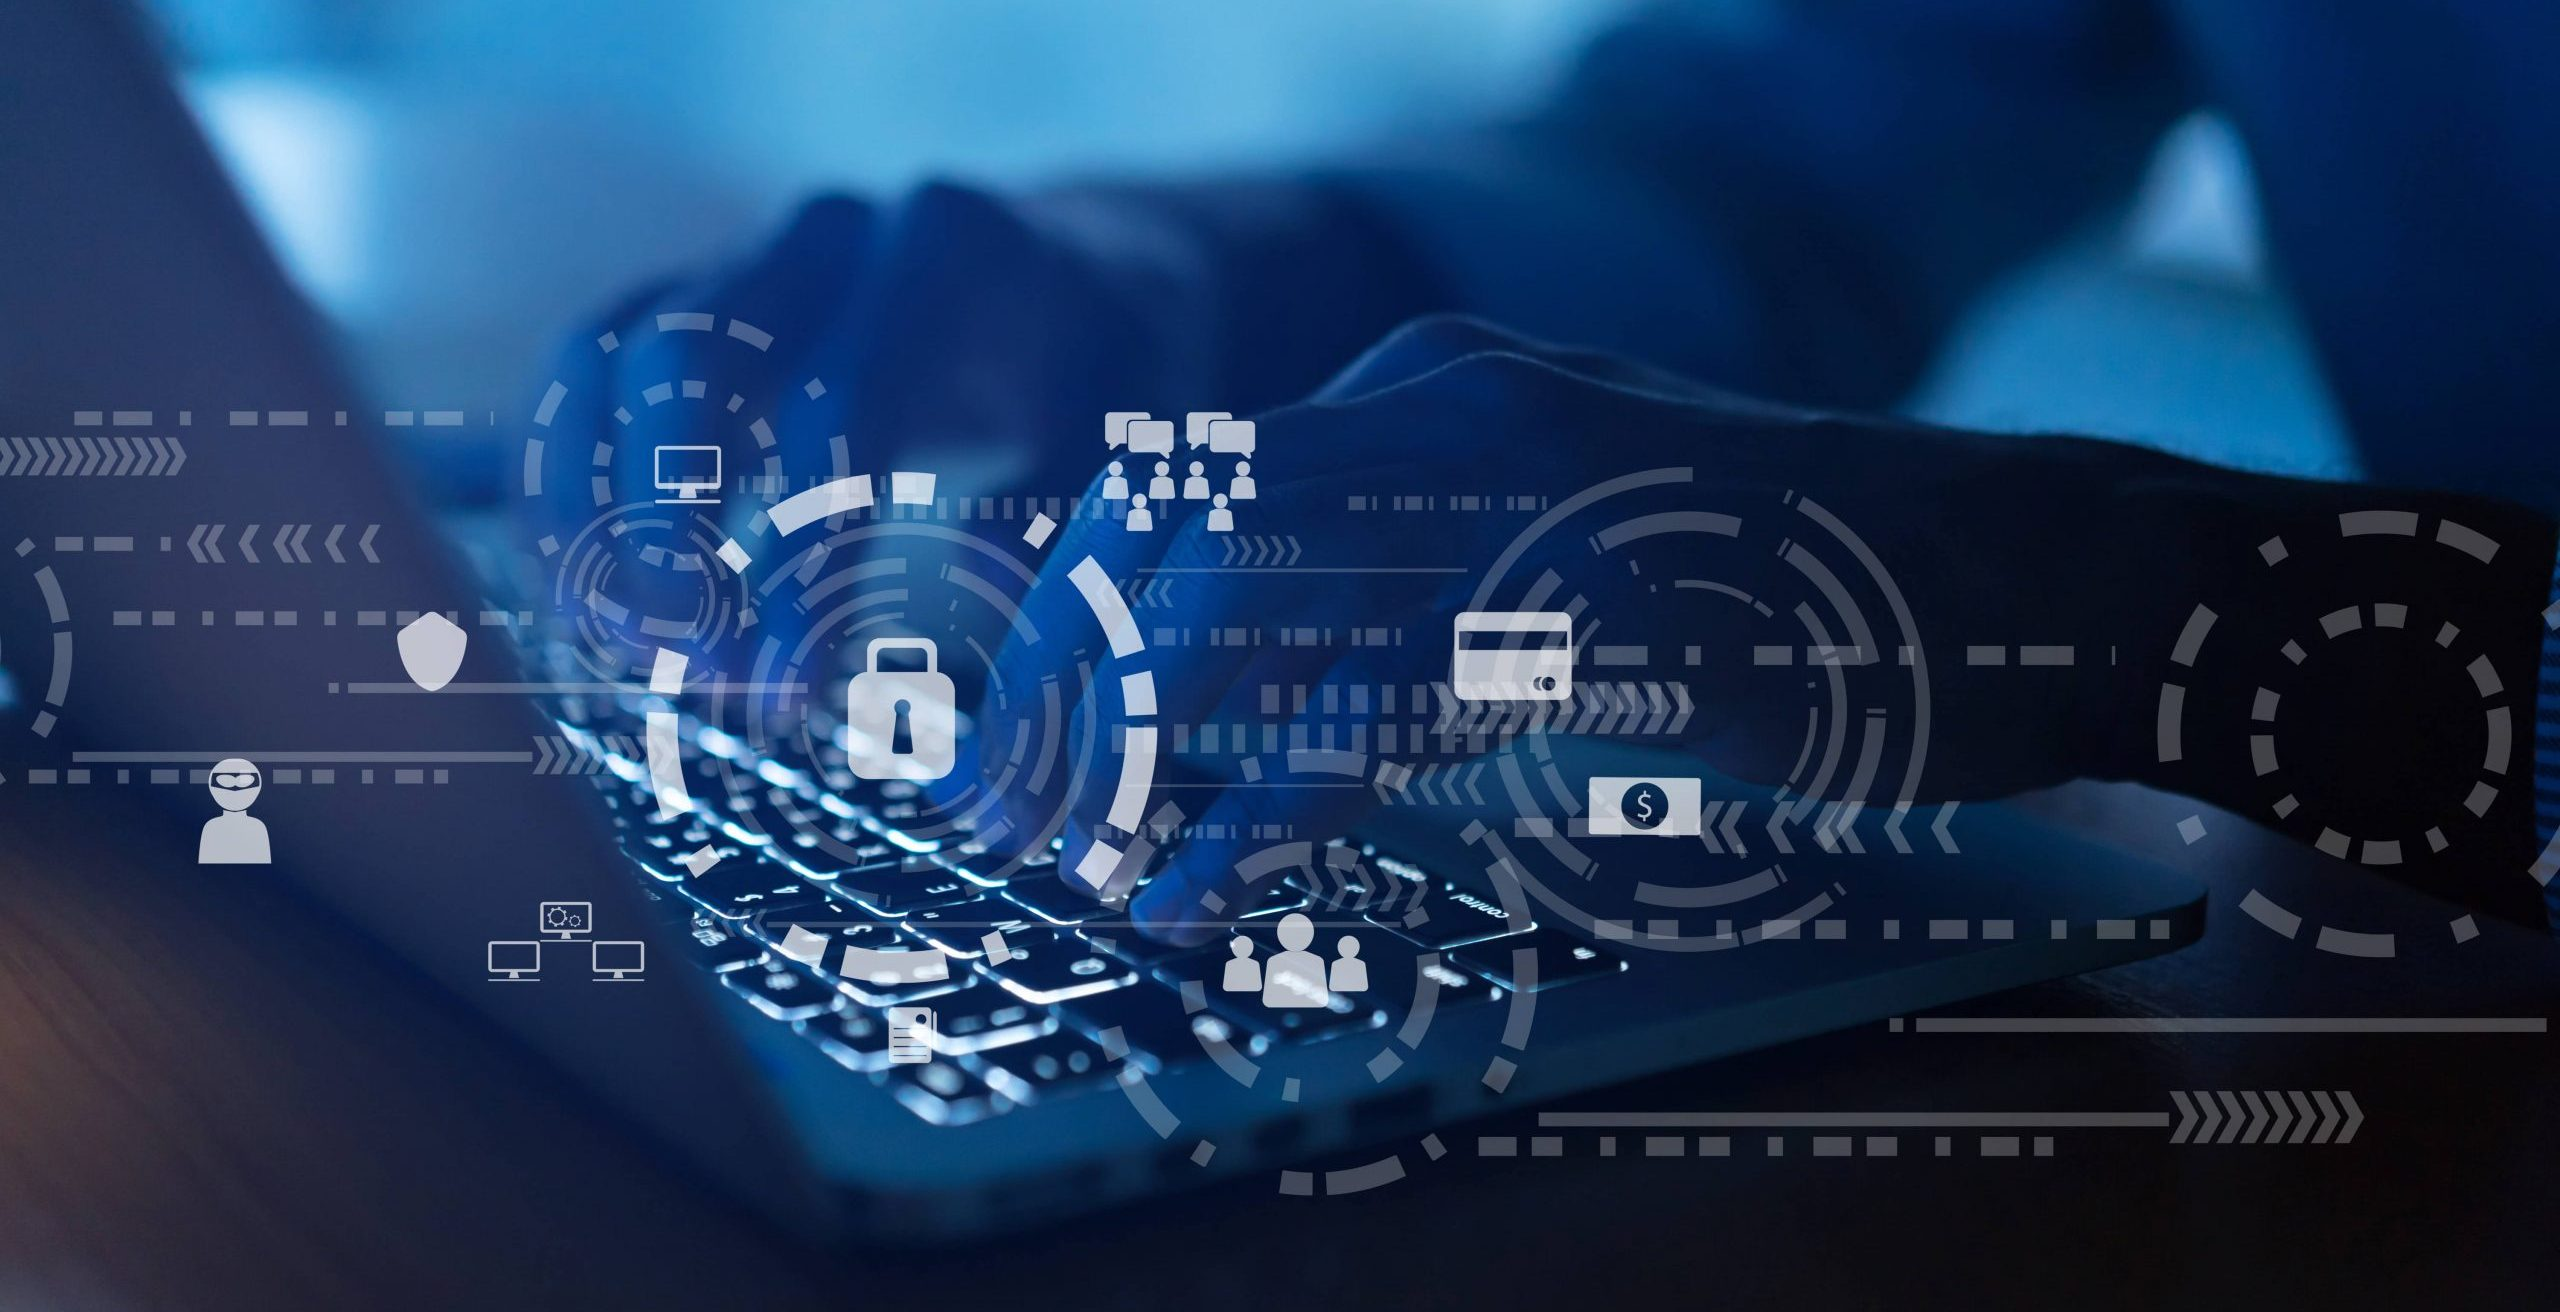 Countering Cybersecurity Attacks through Accountability